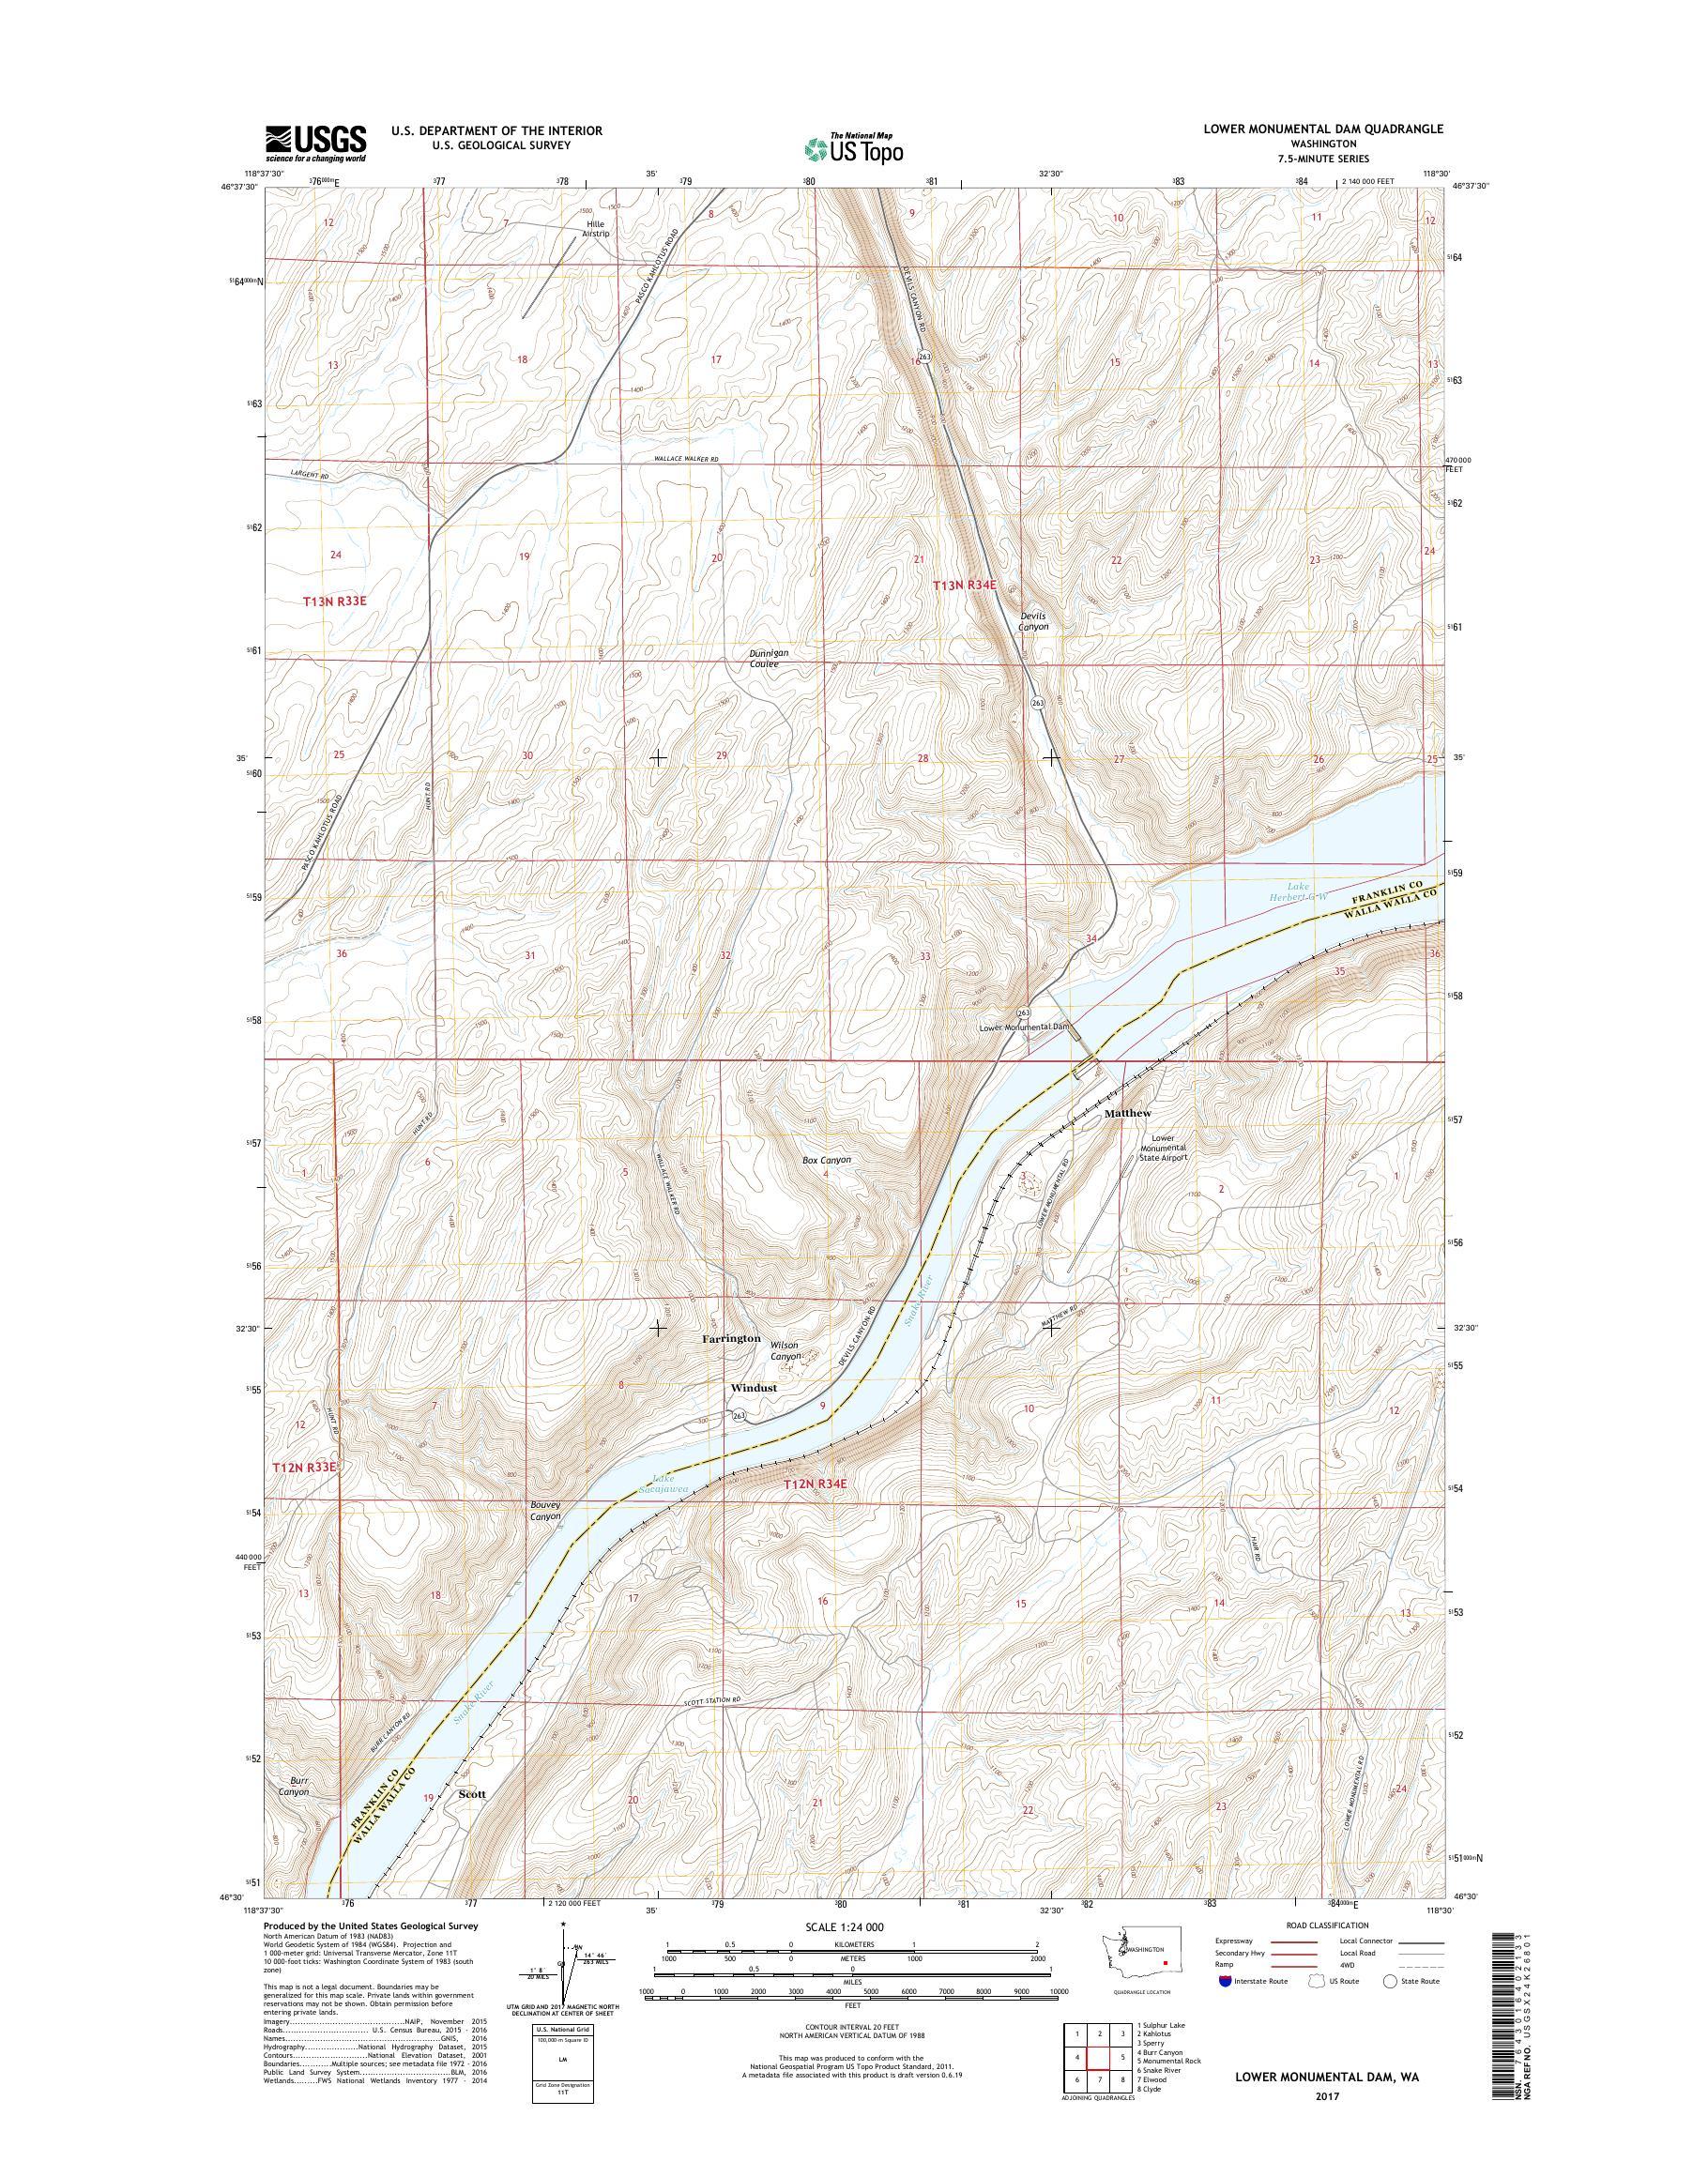 MyTopo Lower Monumental Dam, Washington USGS Quad Topo Map